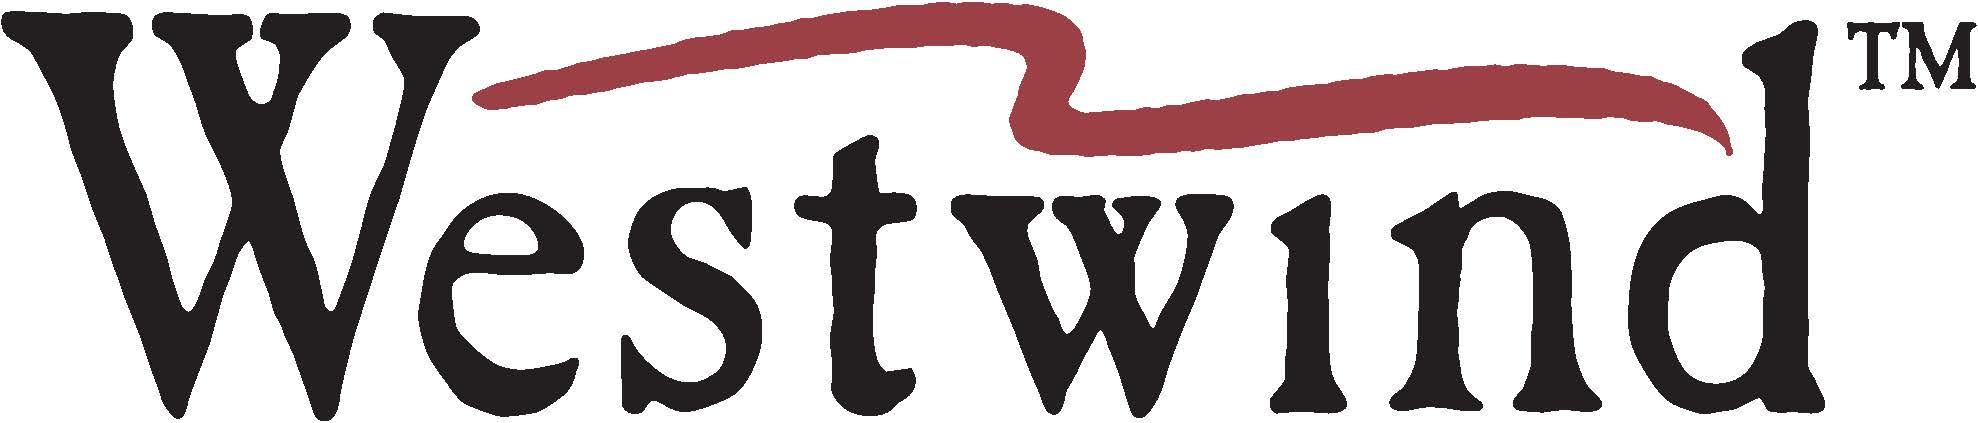 Westwind Wood Specialties